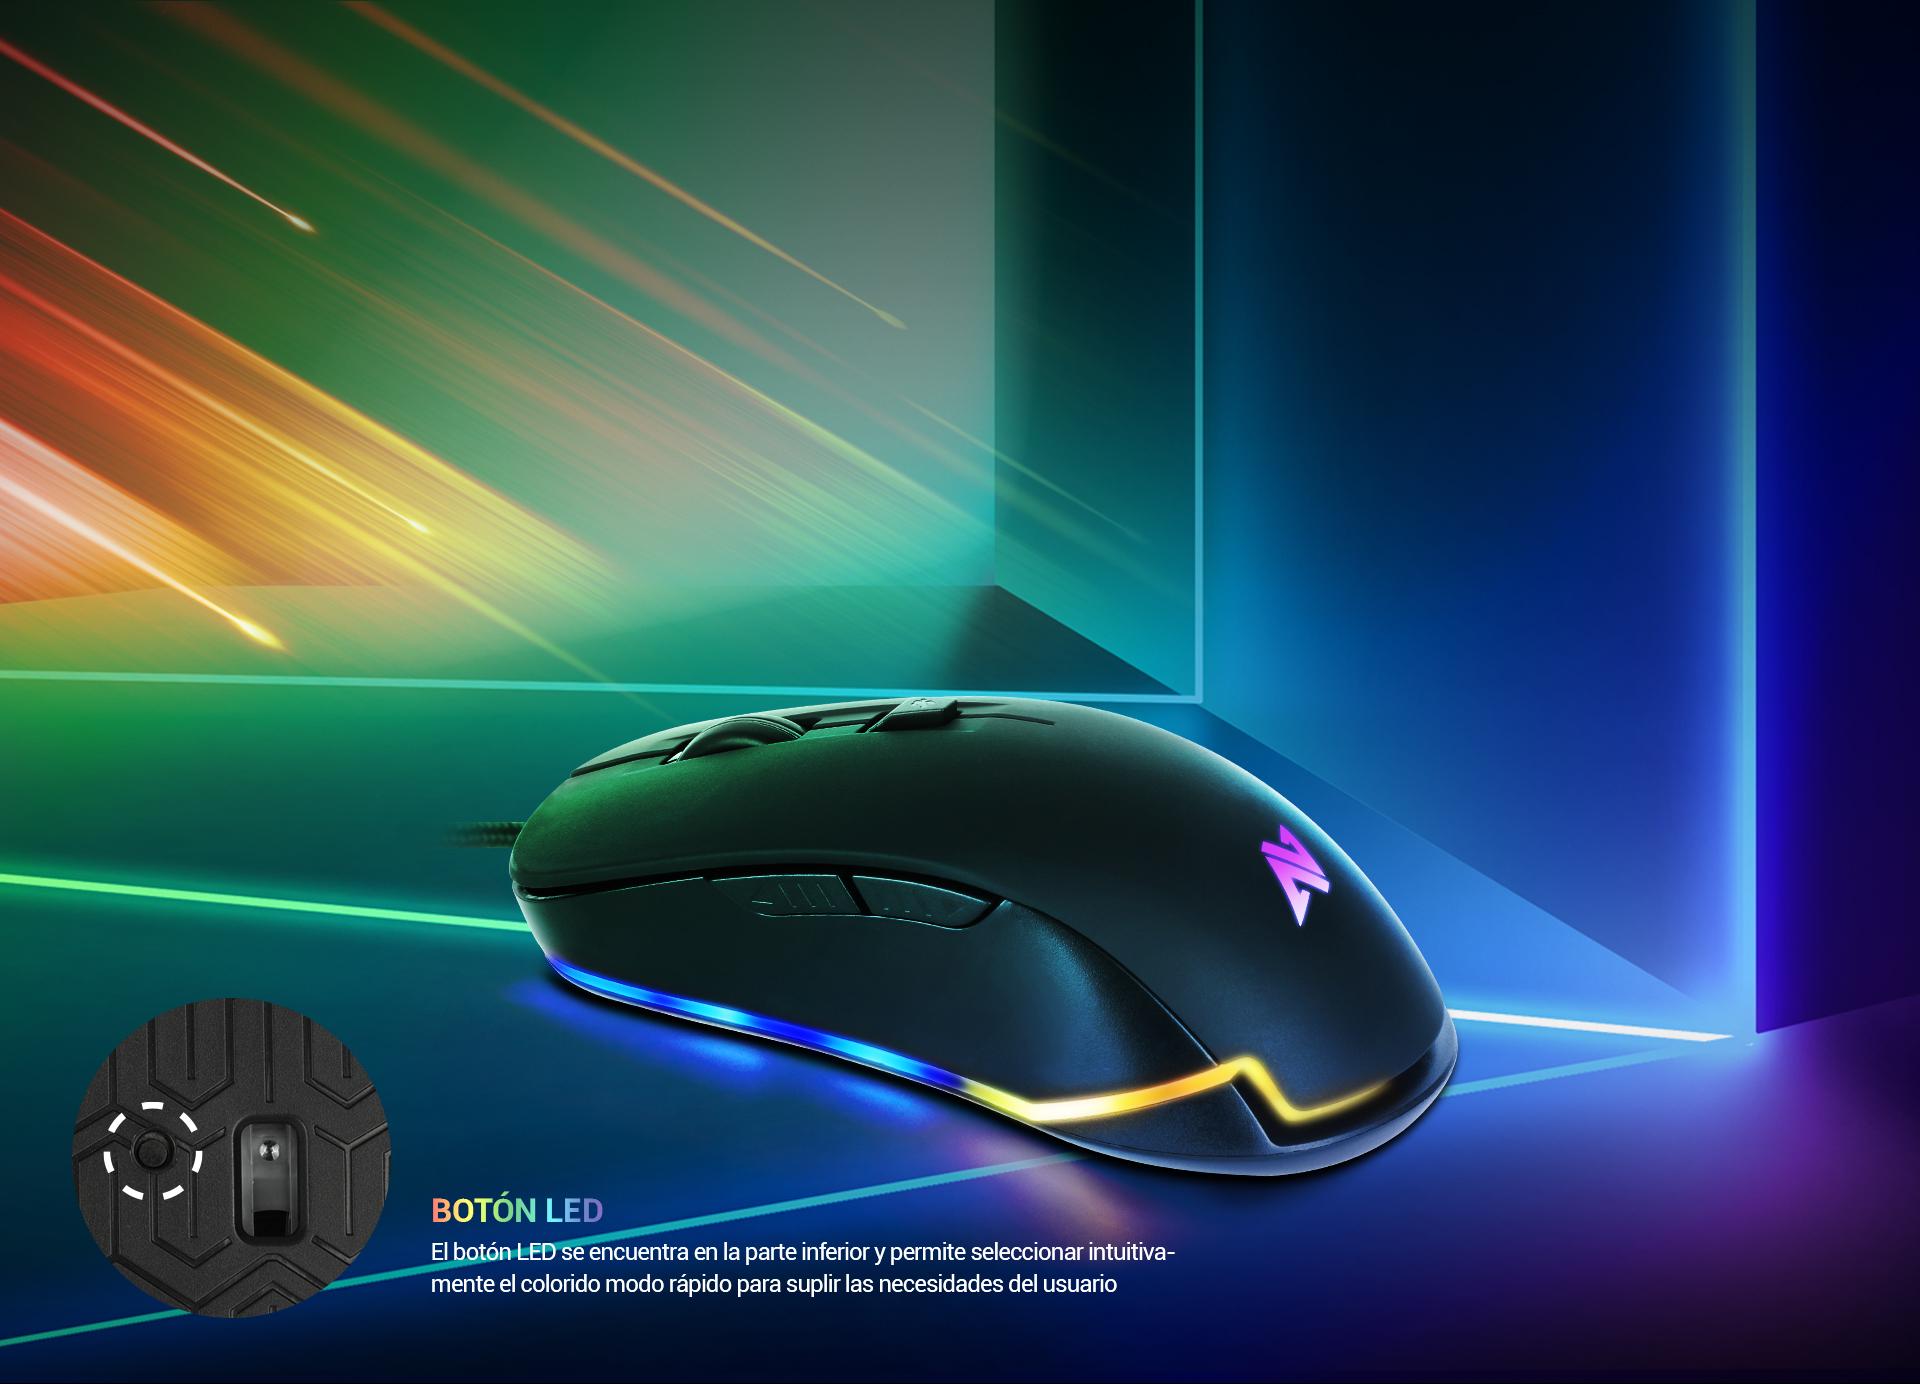 Ratón Gaming Astra AM8 imagen descripción Colores Led